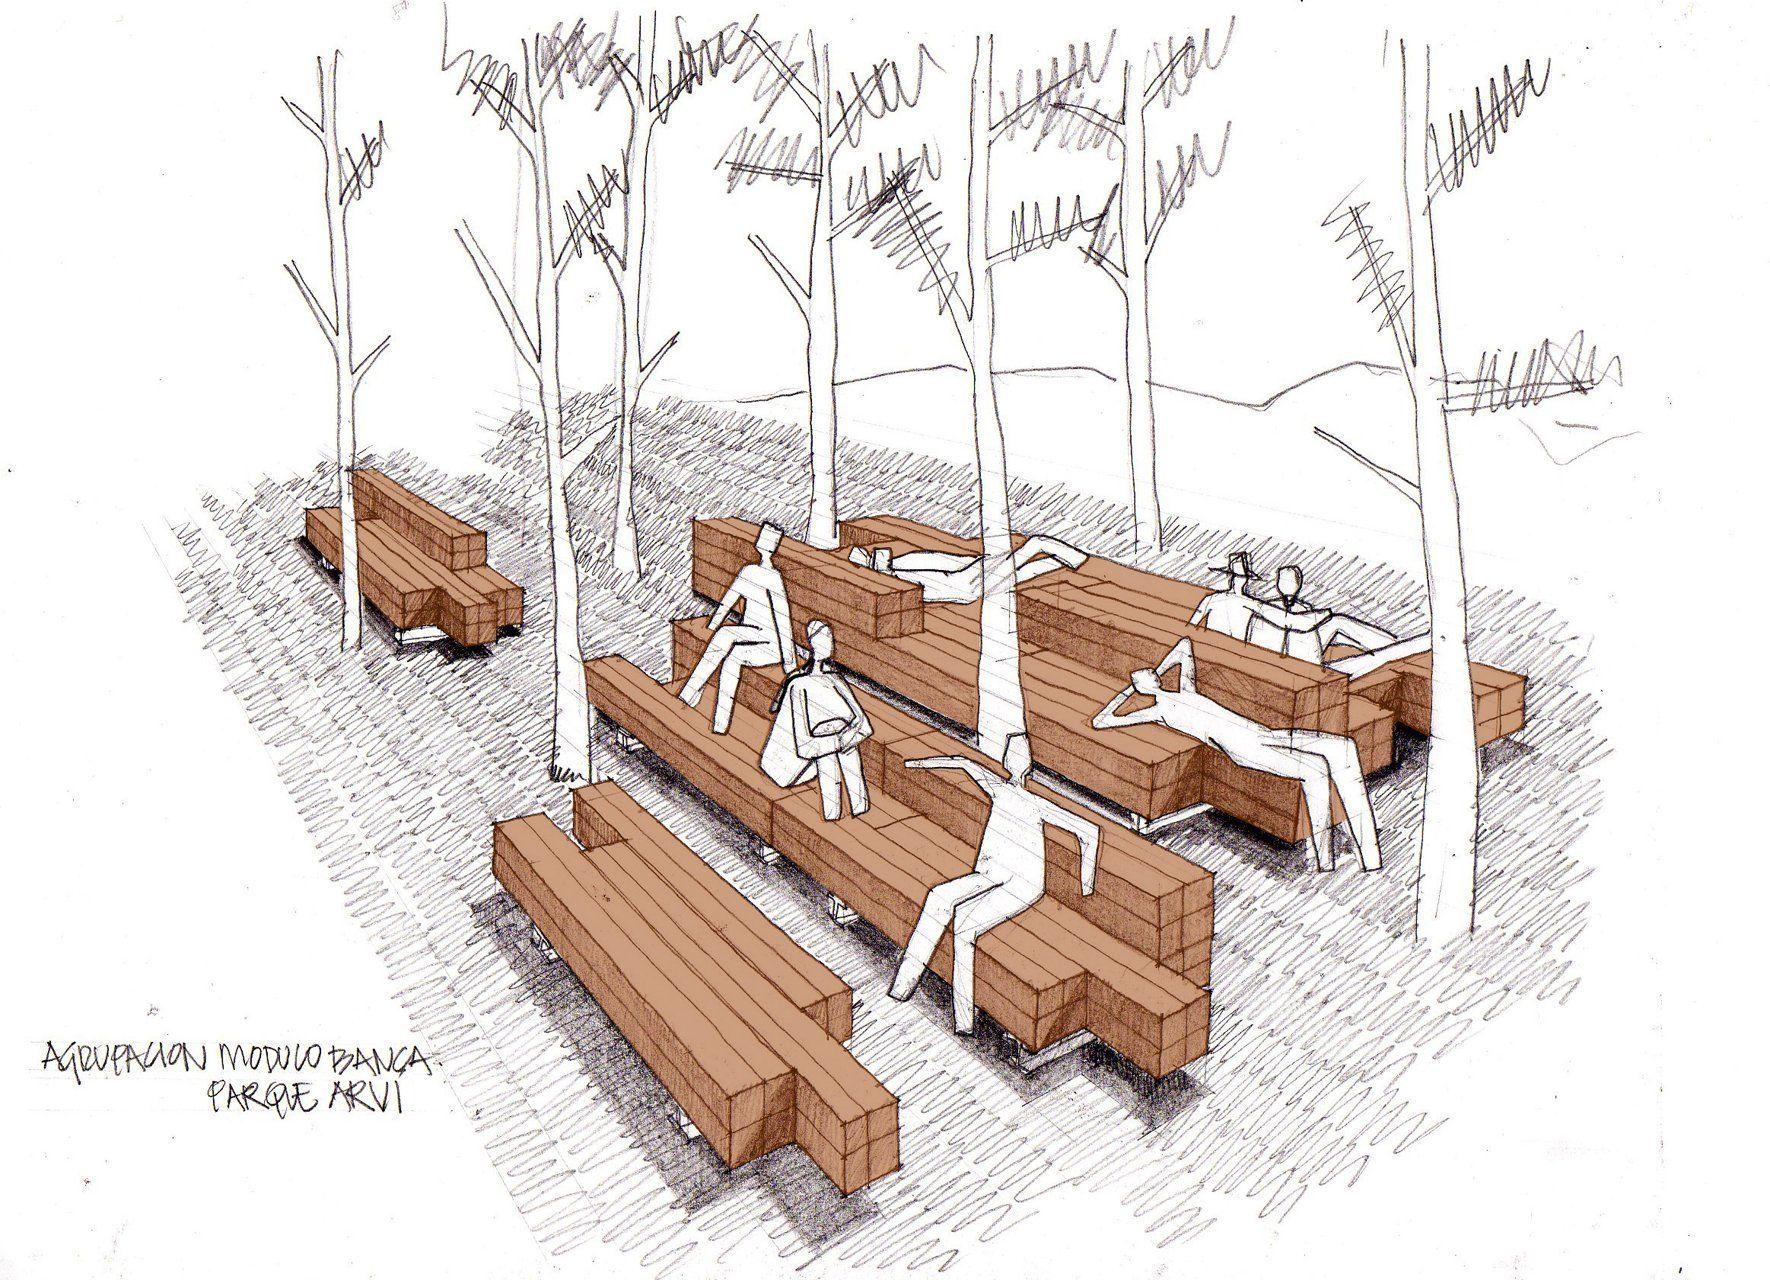 Dibujos de bancas de parques arquitectura buscar con for Plan de arquitectura